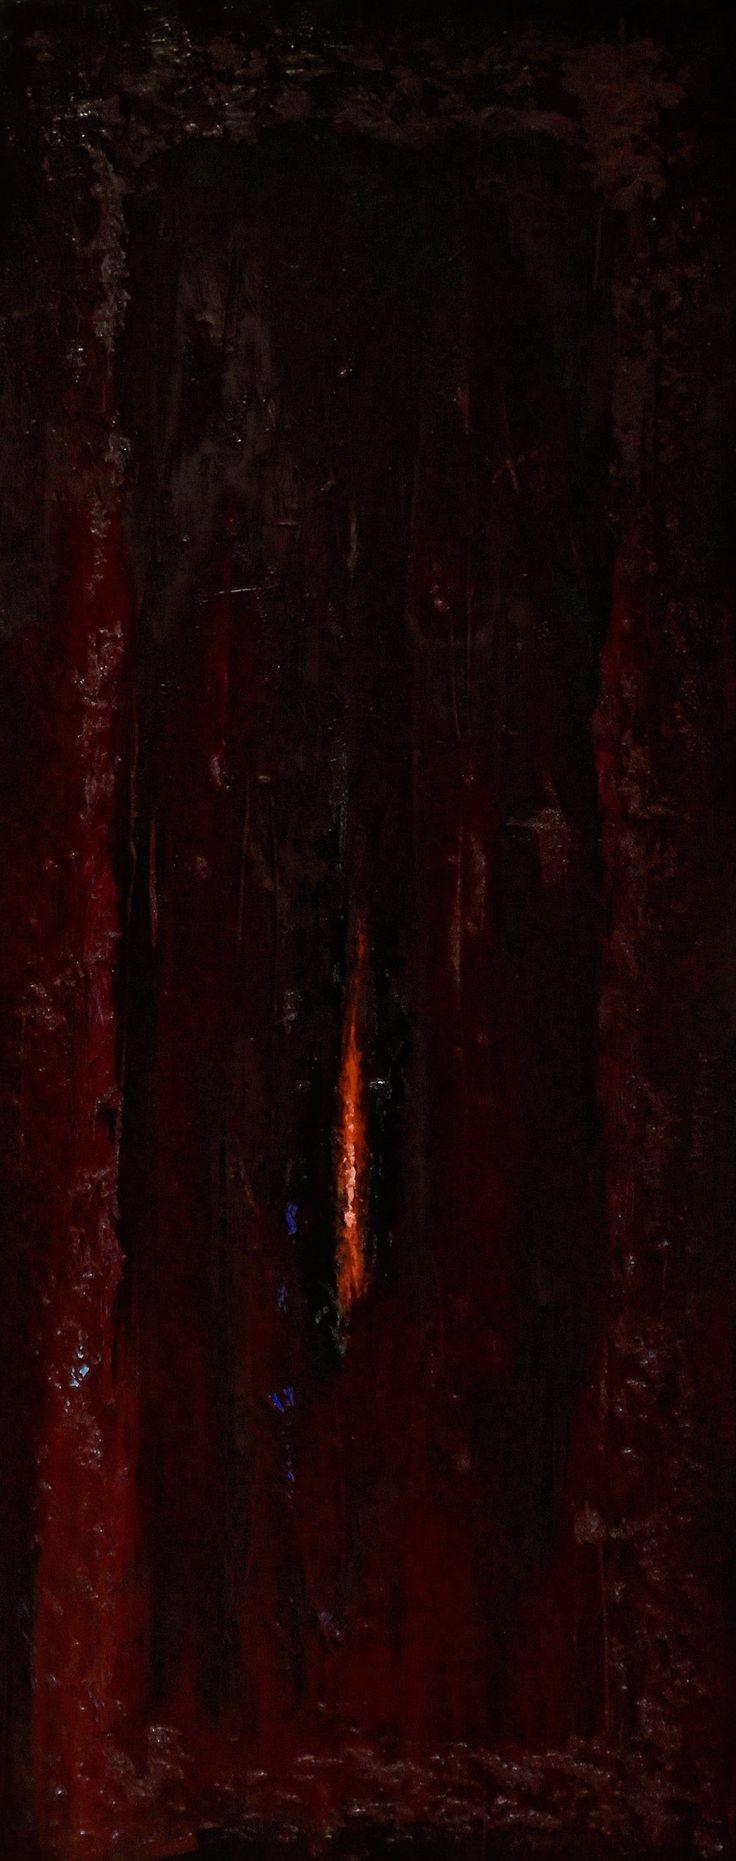 Femininity - abstract nude art by minimal painter Jacek Sikora